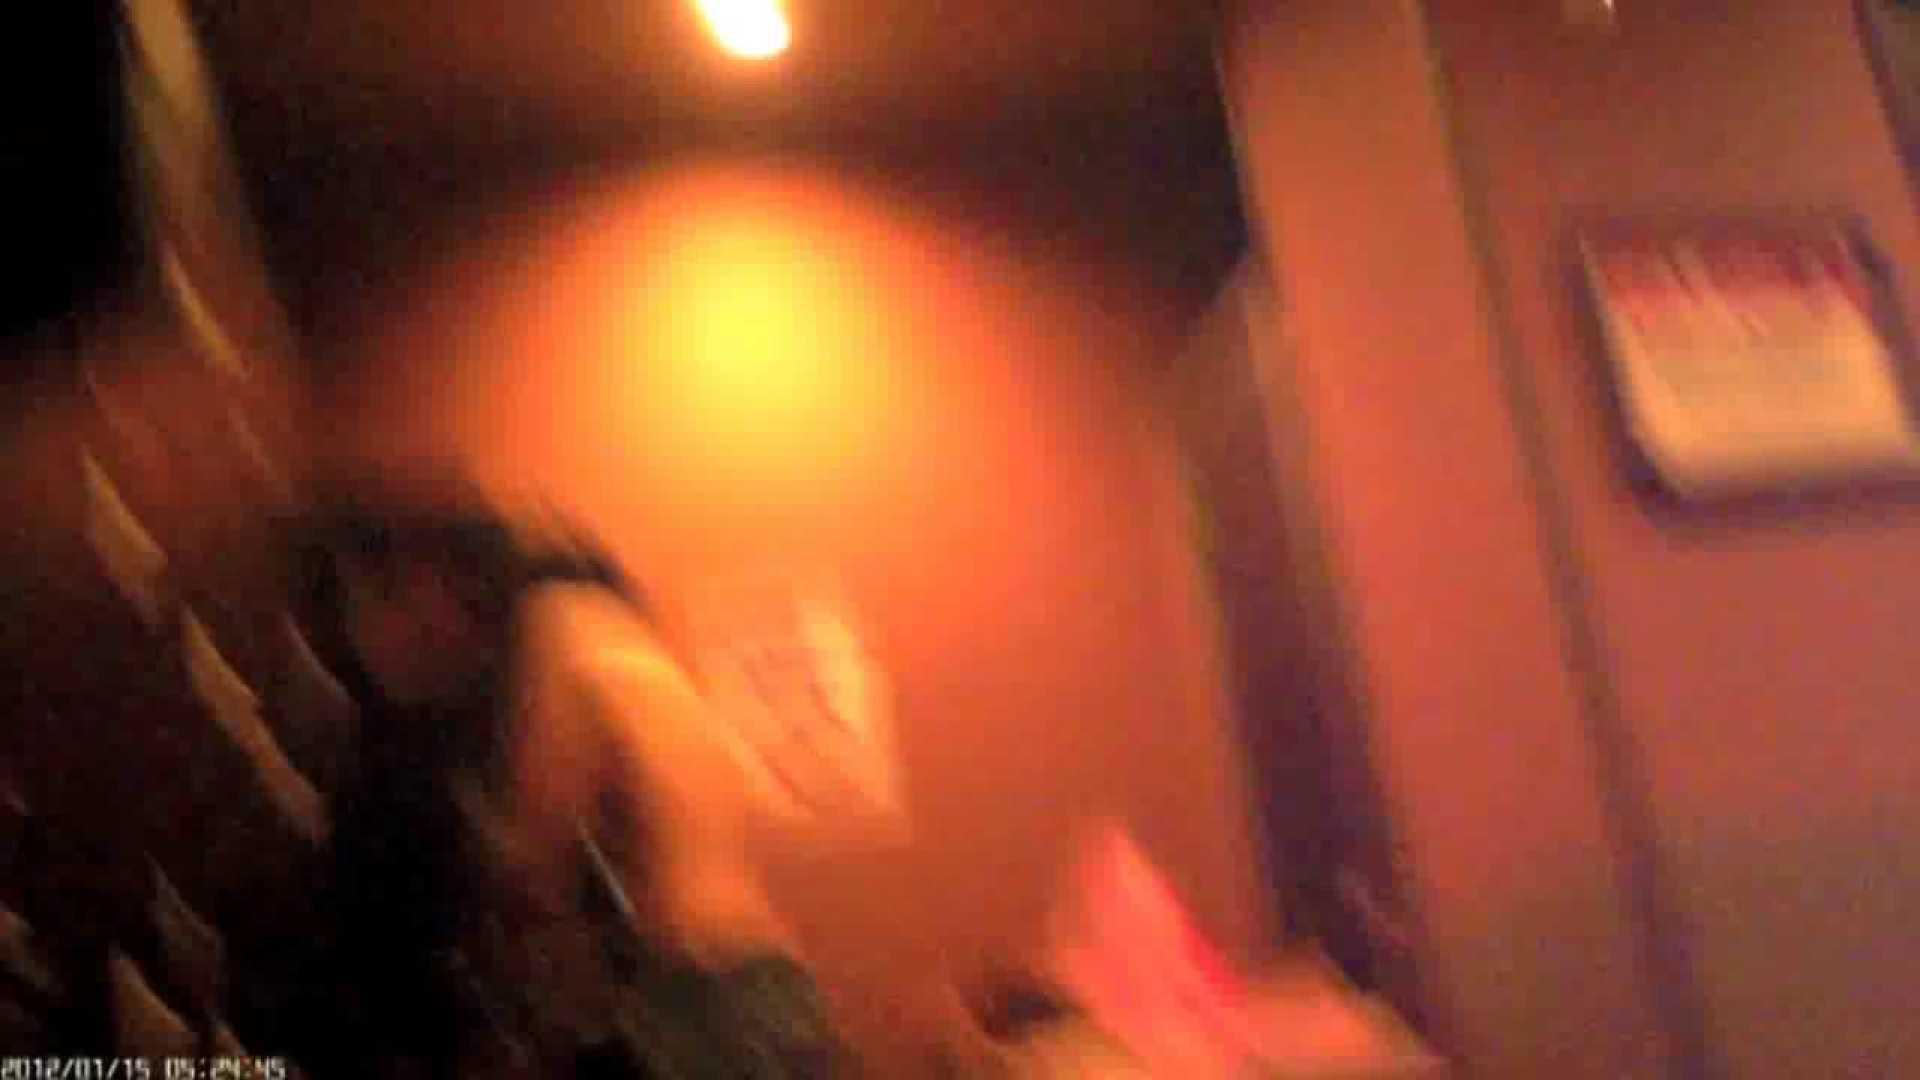 現役ギャル盗撮師 hana様の女風呂潜入撮!Vol.6 盗撮 SEX無修正画像 63枚 52